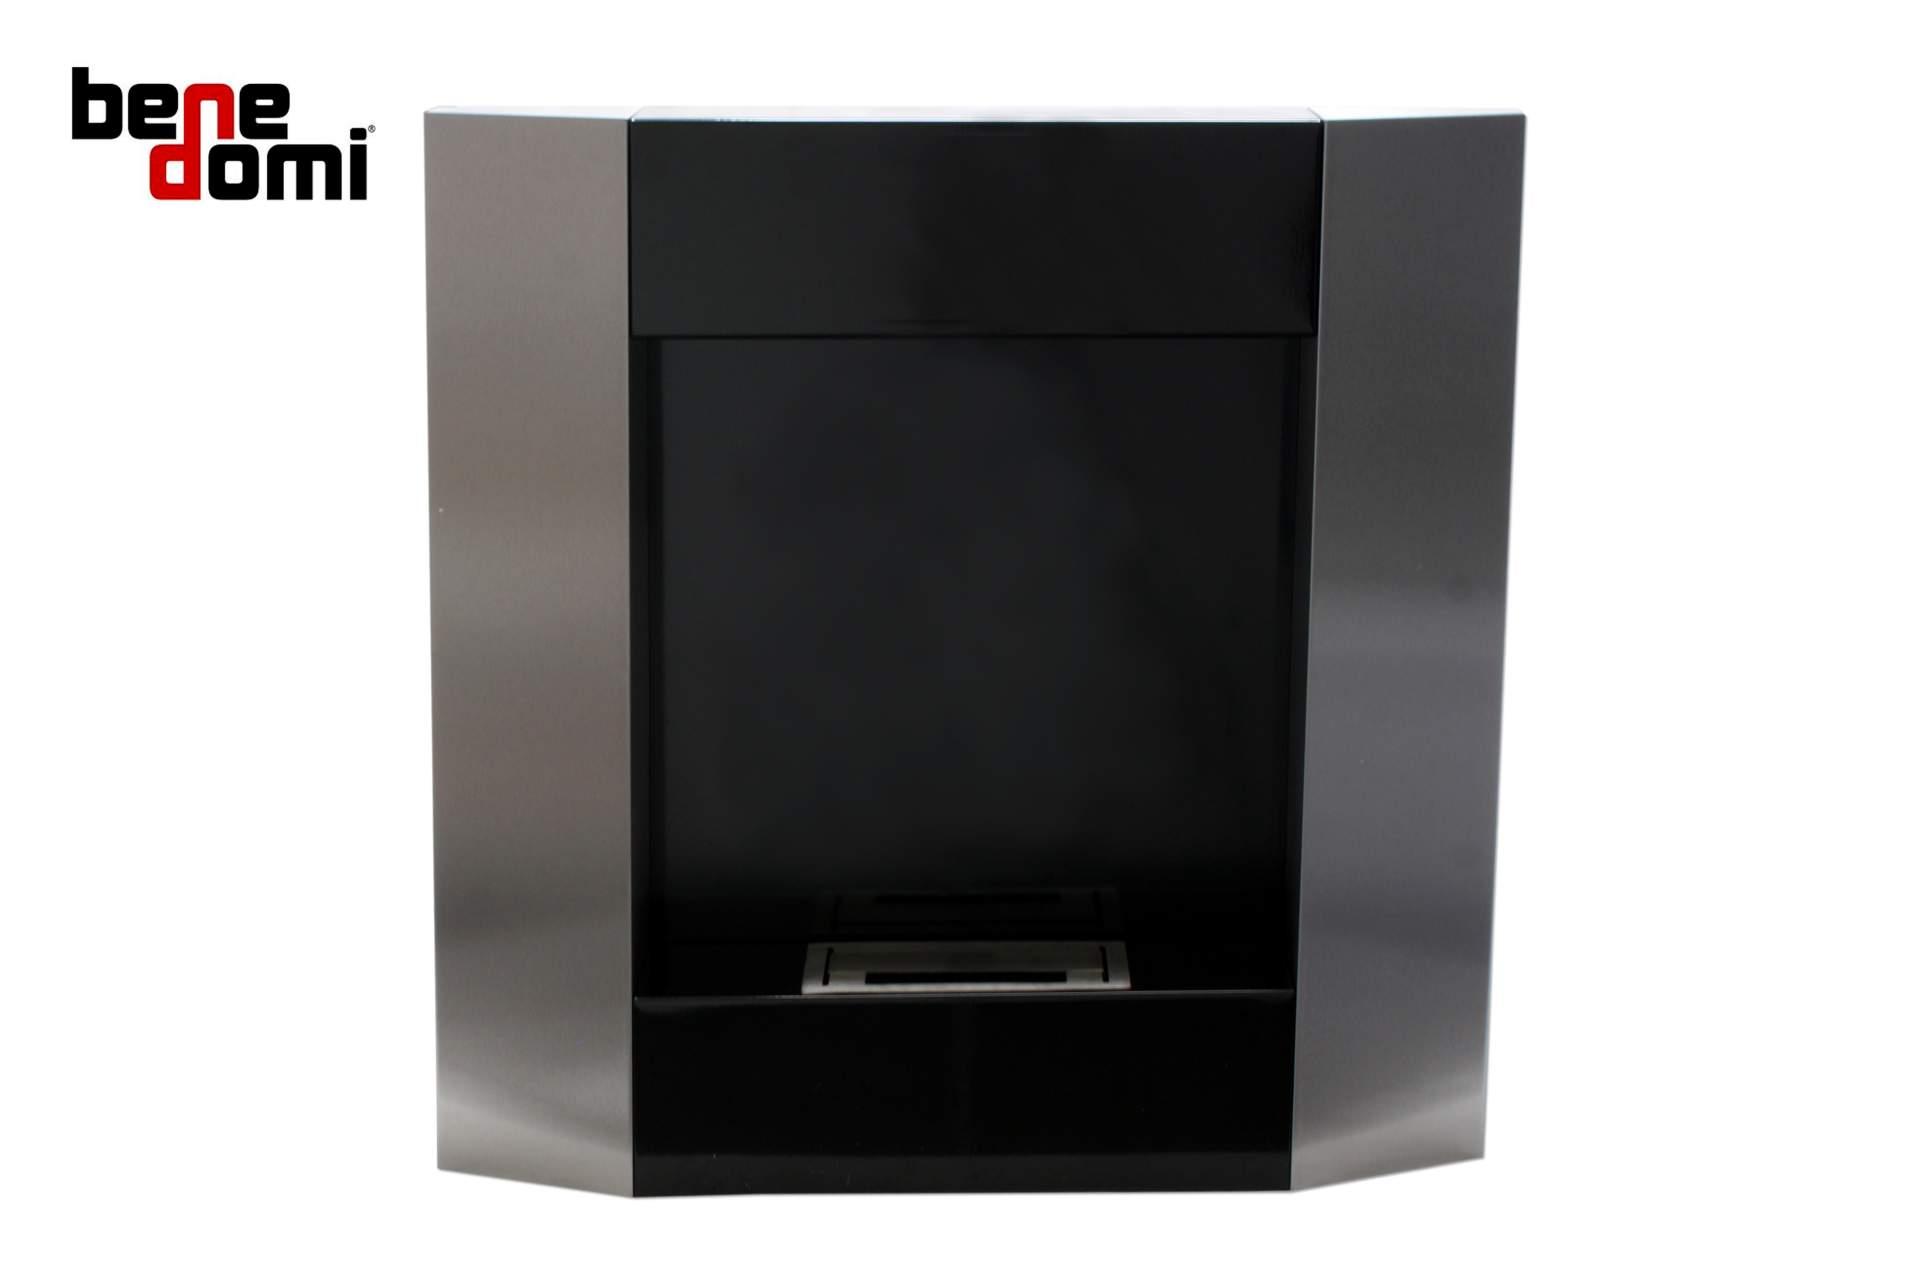 wandkamin stege edelstahl bioethanol gelkamin ofen kamin 72 cm wandmontage neu ebay. Black Bedroom Furniture Sets. Home Design Ideas